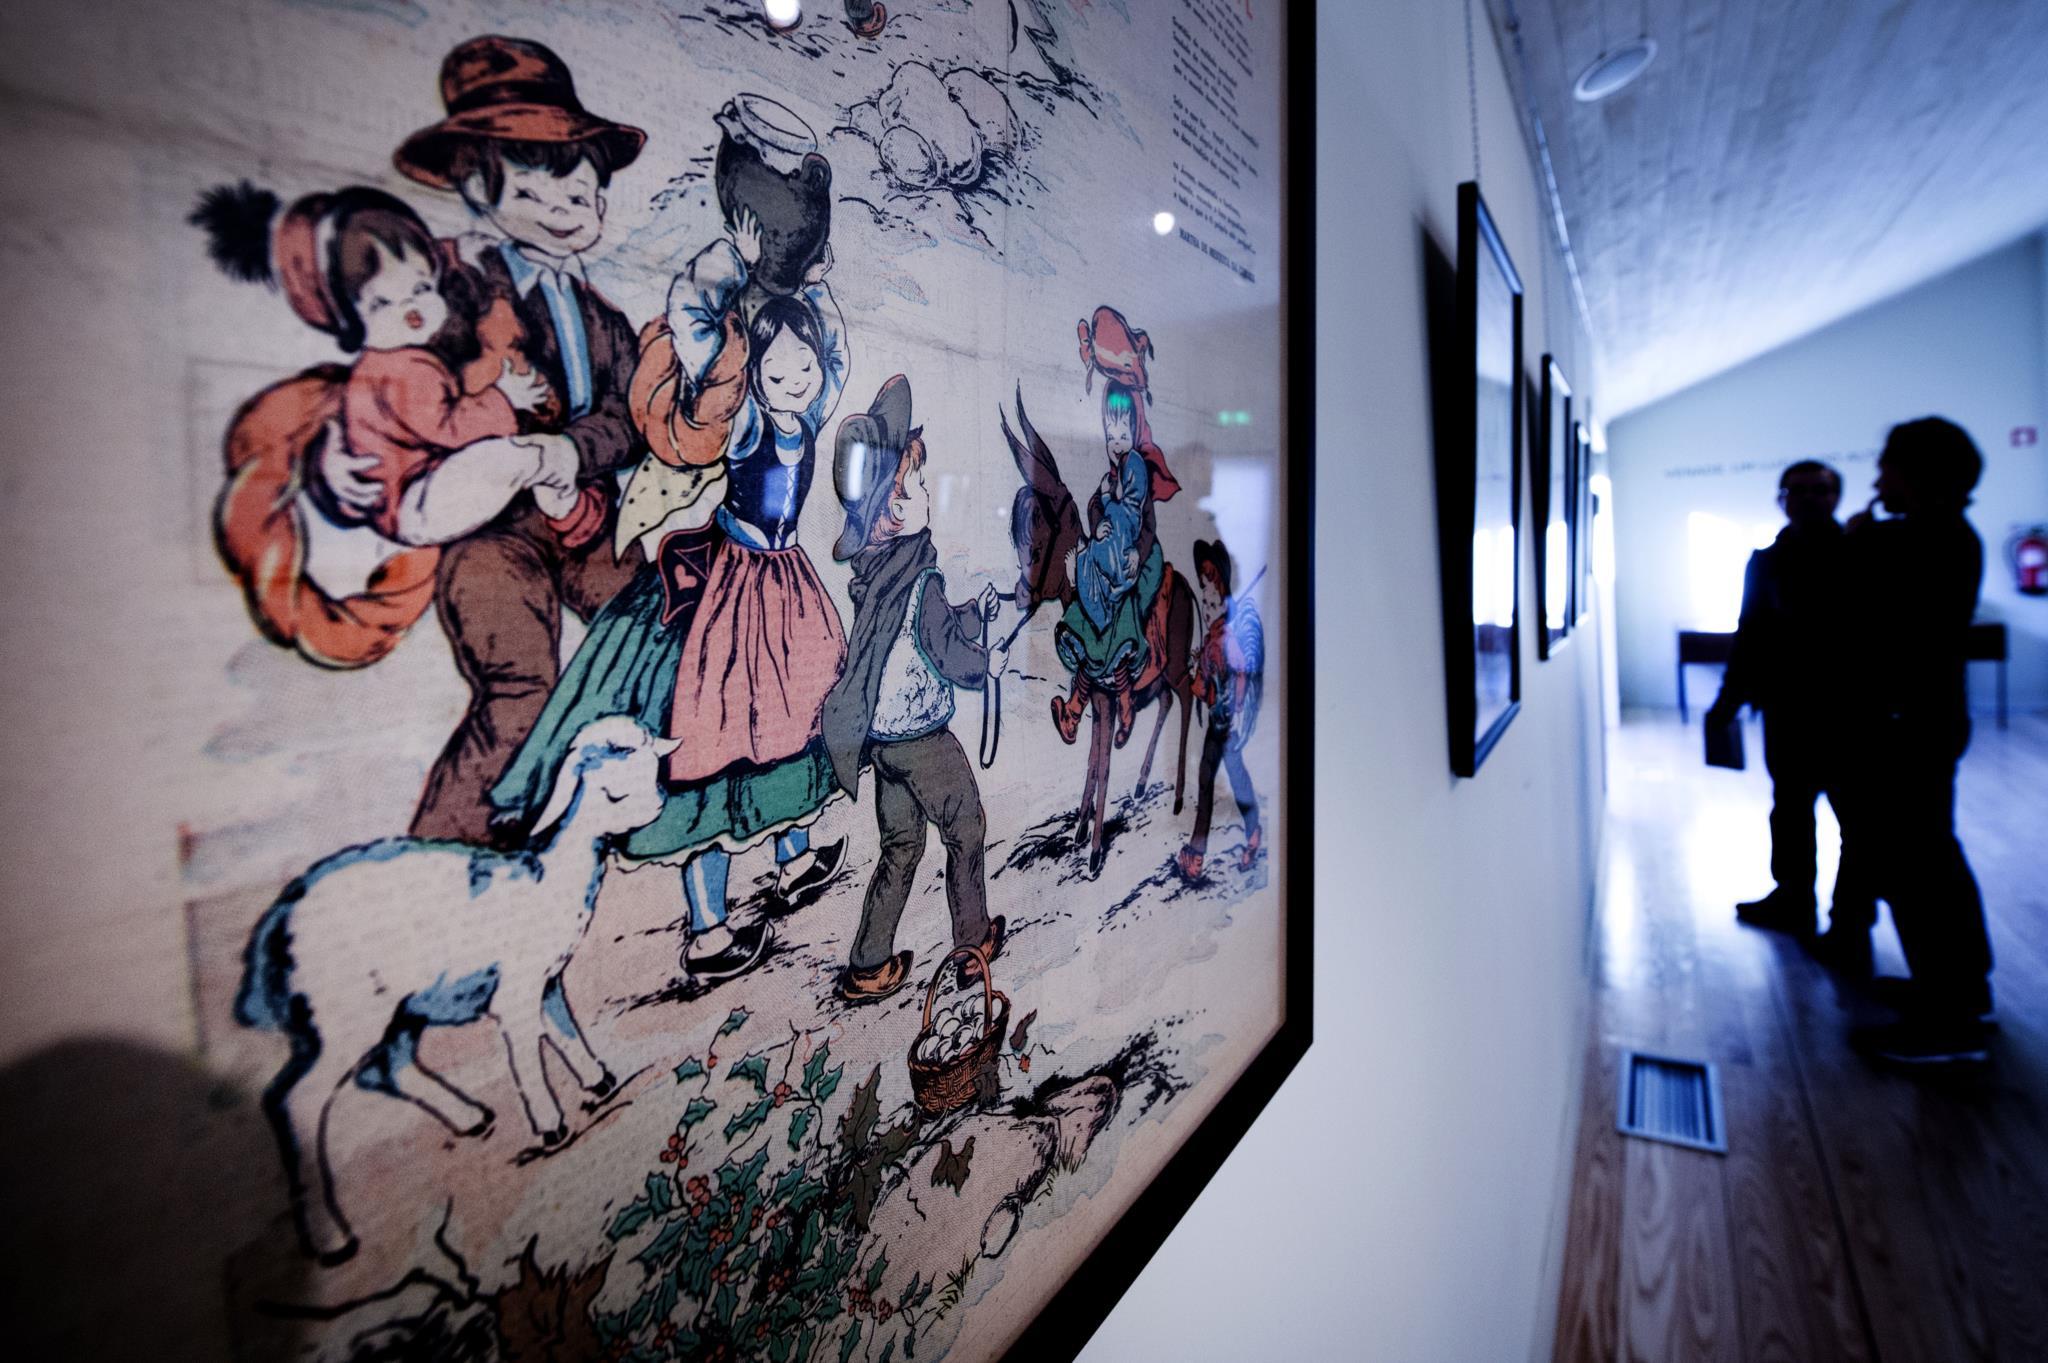 PÚBLICO - A ilustradora que coloriu o Portugal do século XX